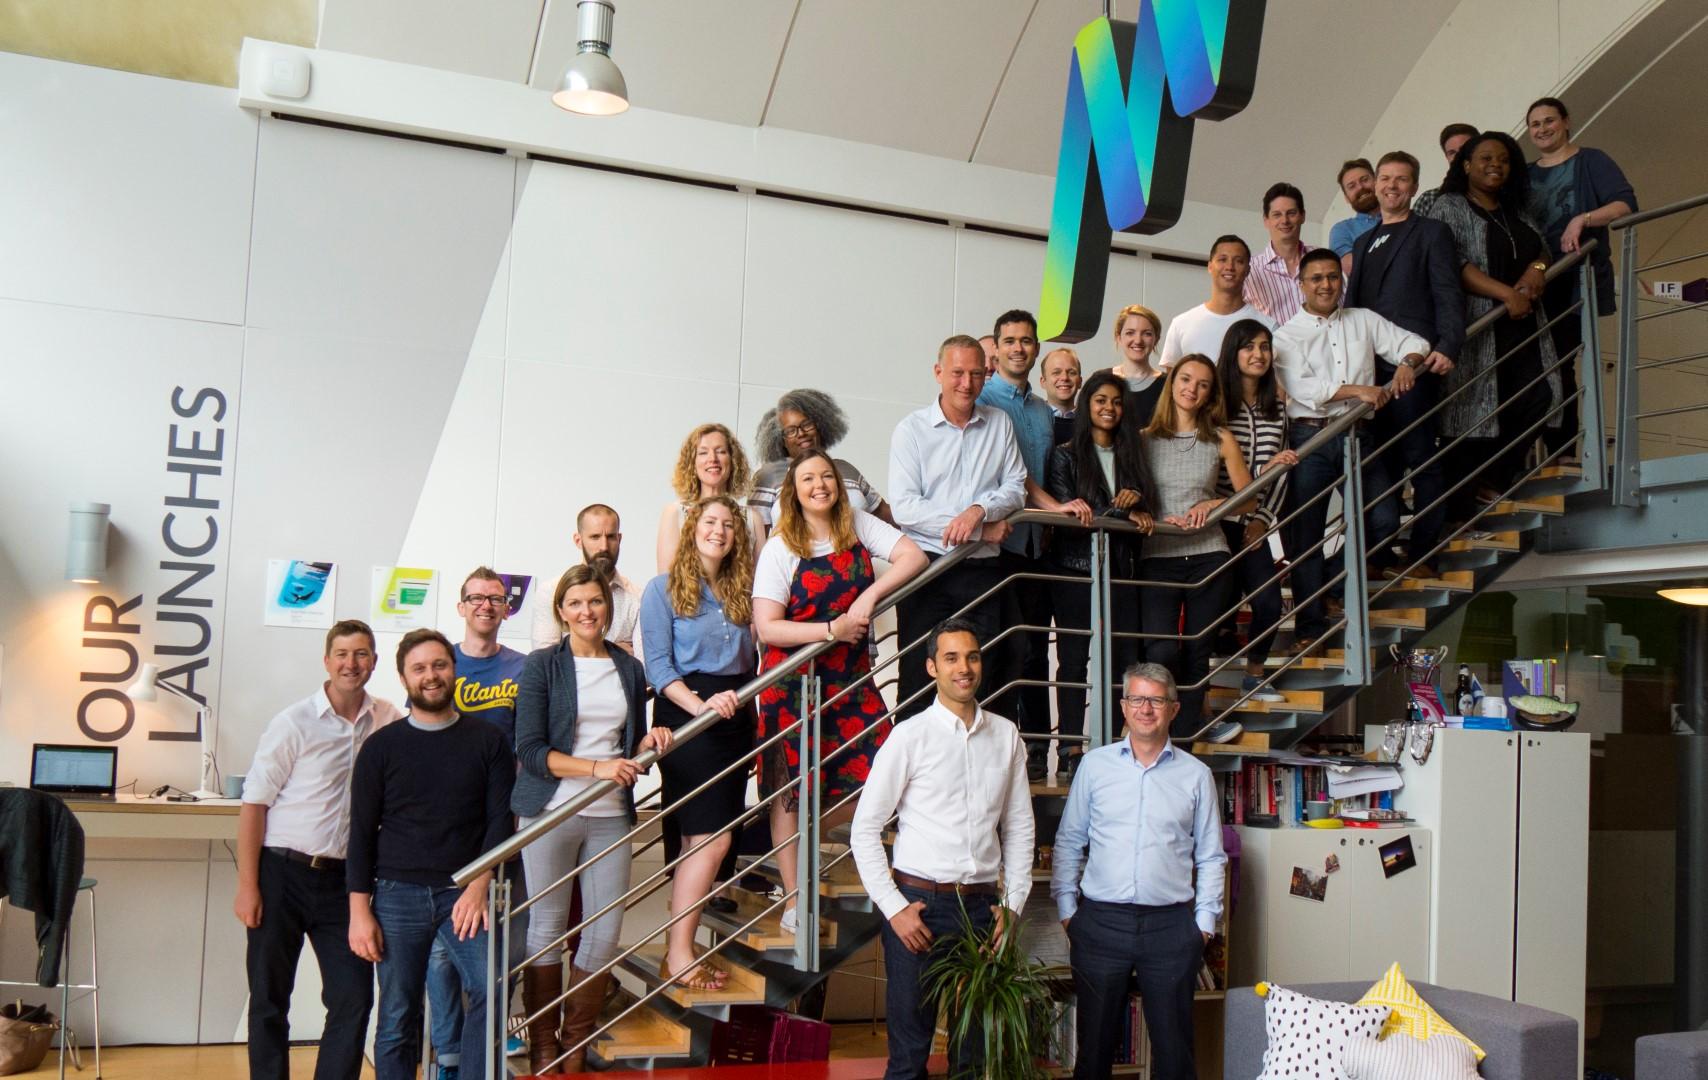 The Market Gravity team